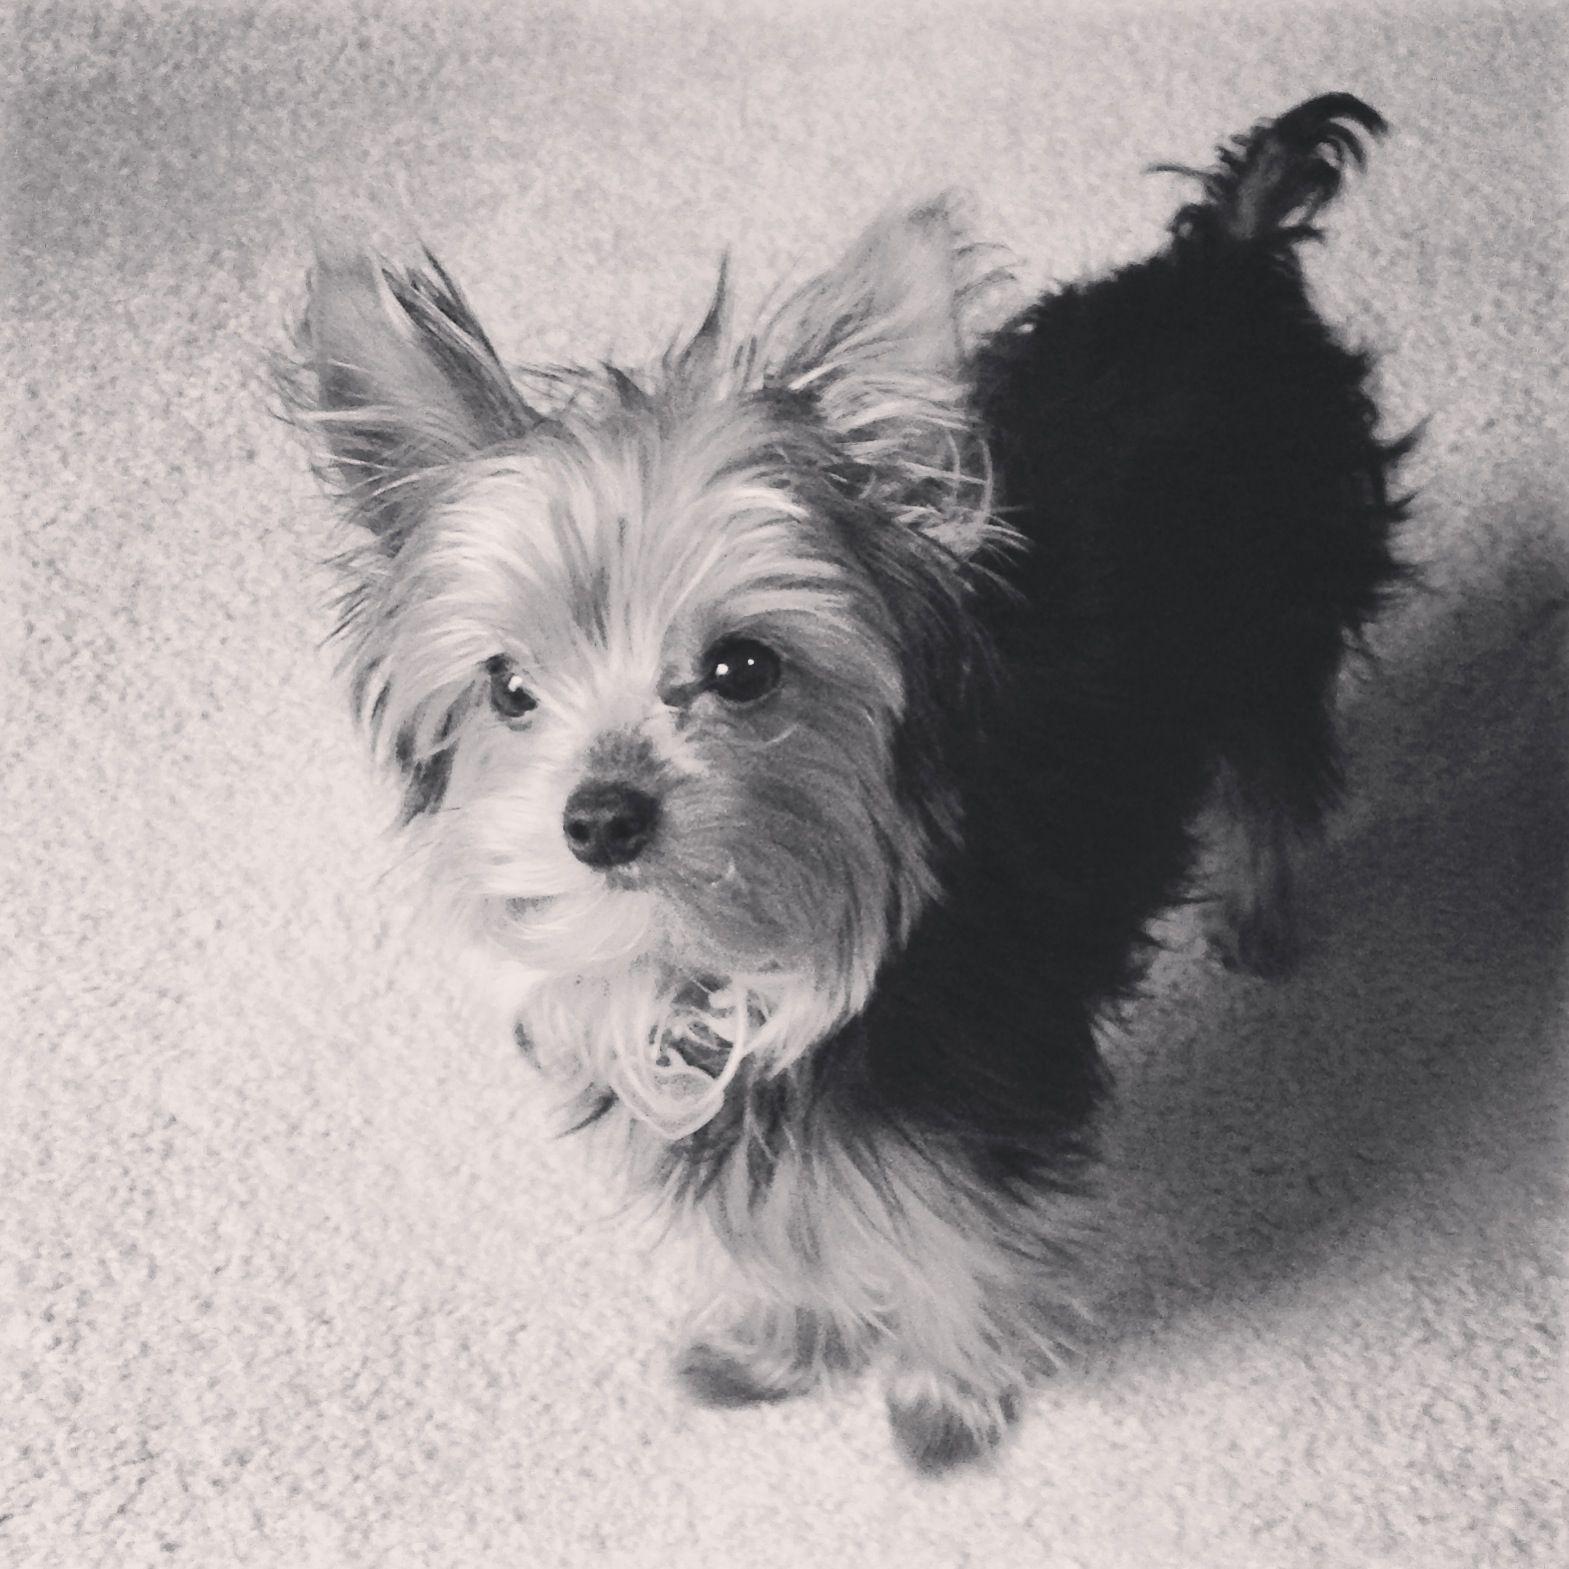 Black White Of My Yorkie Penny 3 Yorkie Cute Puppy Breeds Yorkie Dogs